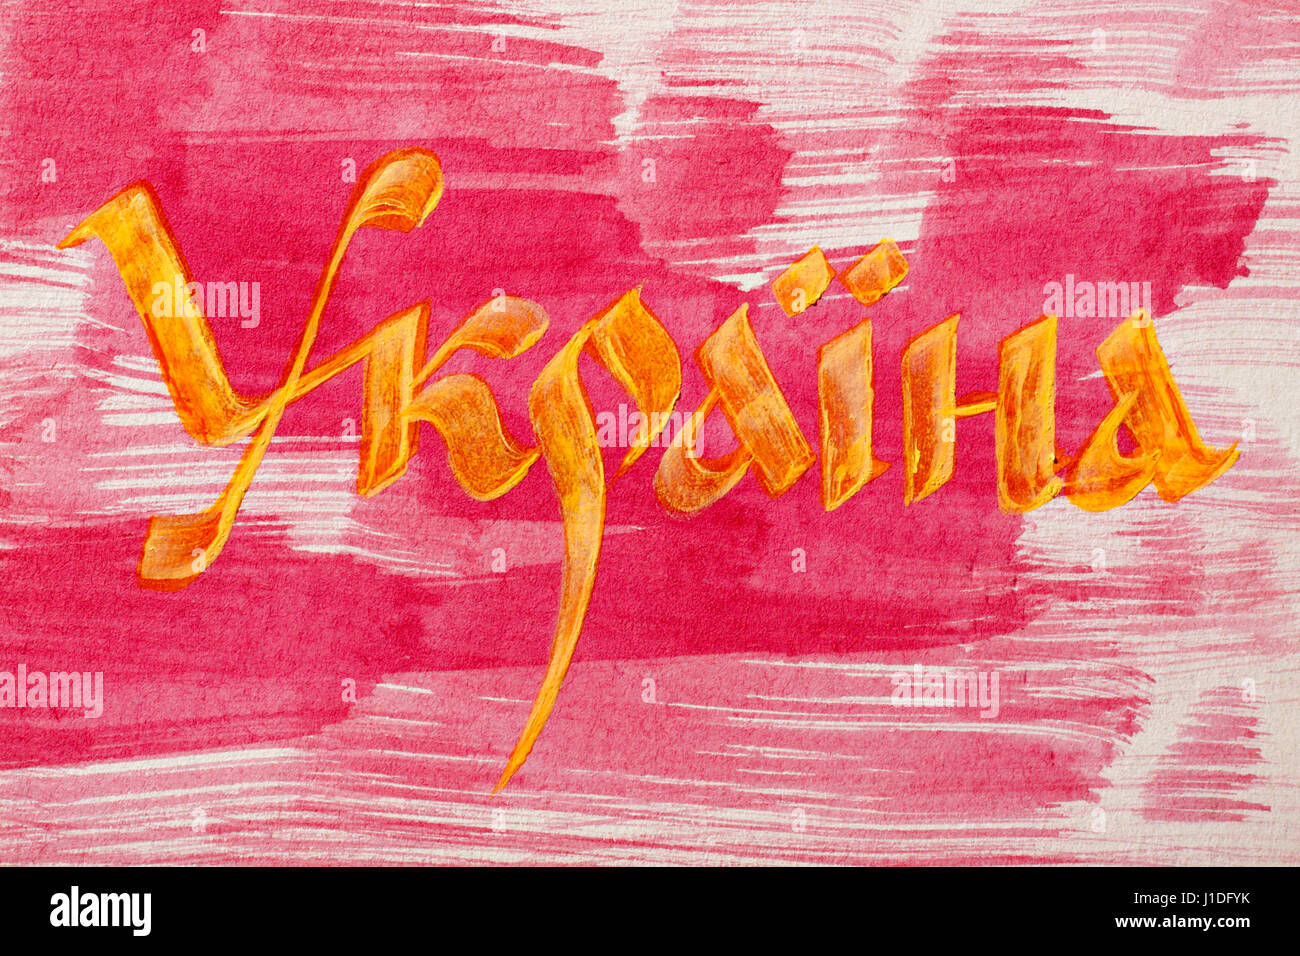 Nombre Del Pais Pintado Sobre Fondo Rojo Ucrania Ukrayina Alfabeto Cirilico Idioma Ucraniano Fotografia De Stock Alamy